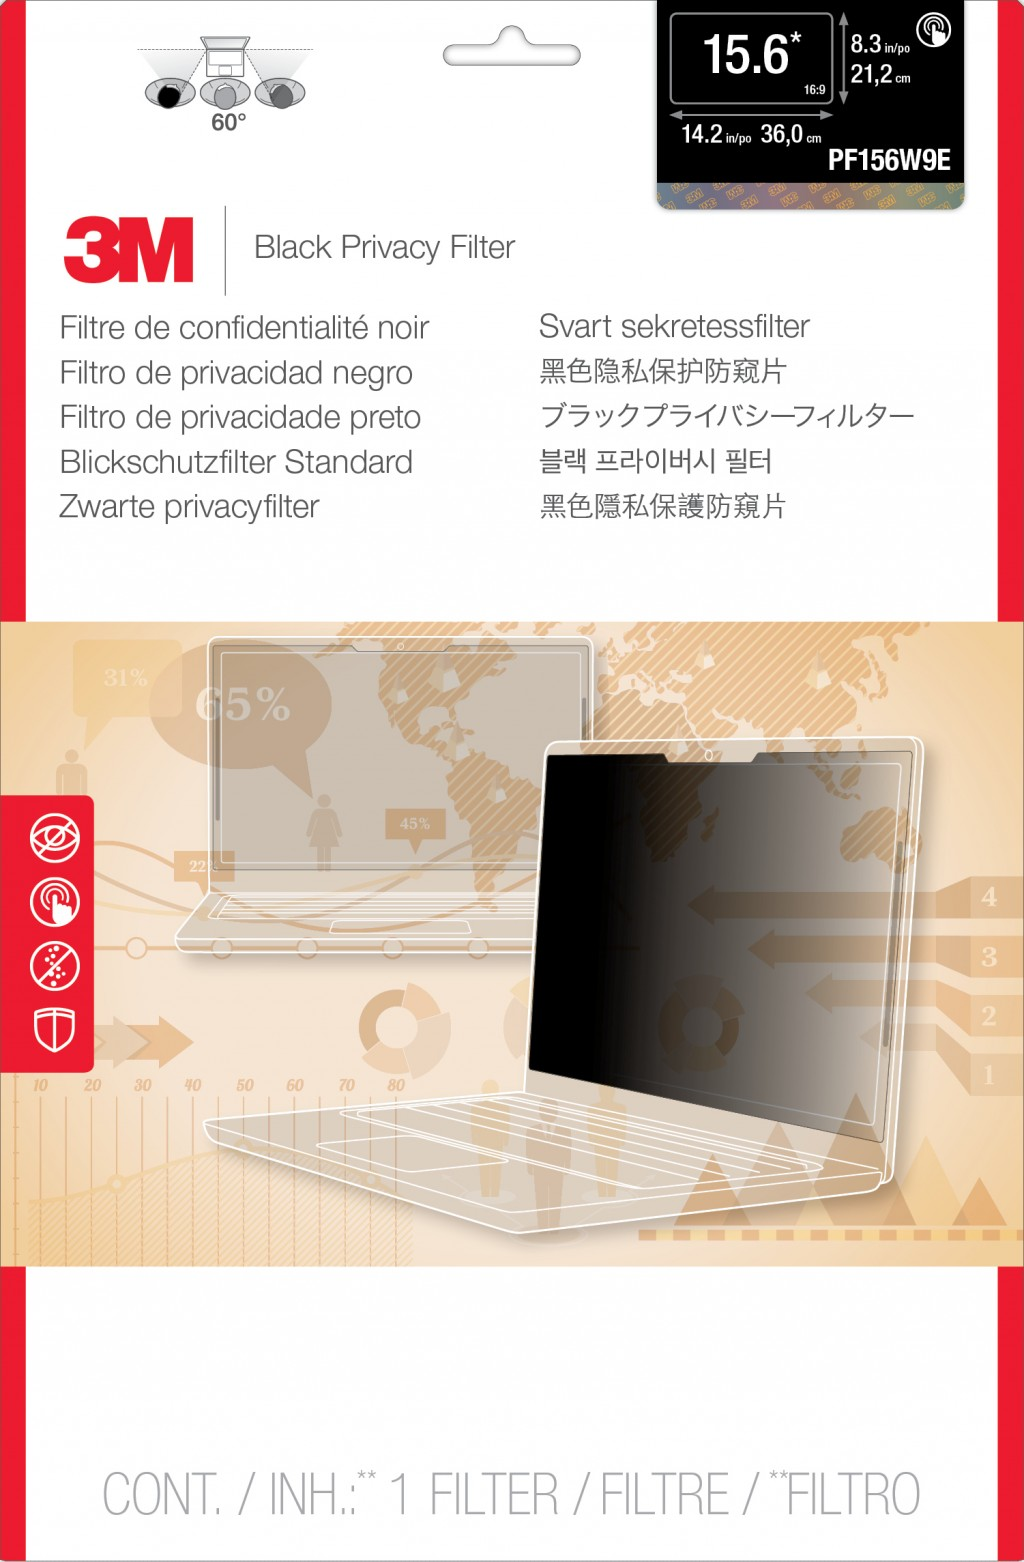 "3M PF156W9E Raamideta ekraani privaatsusfilter 39,6 cm (15.6"")"